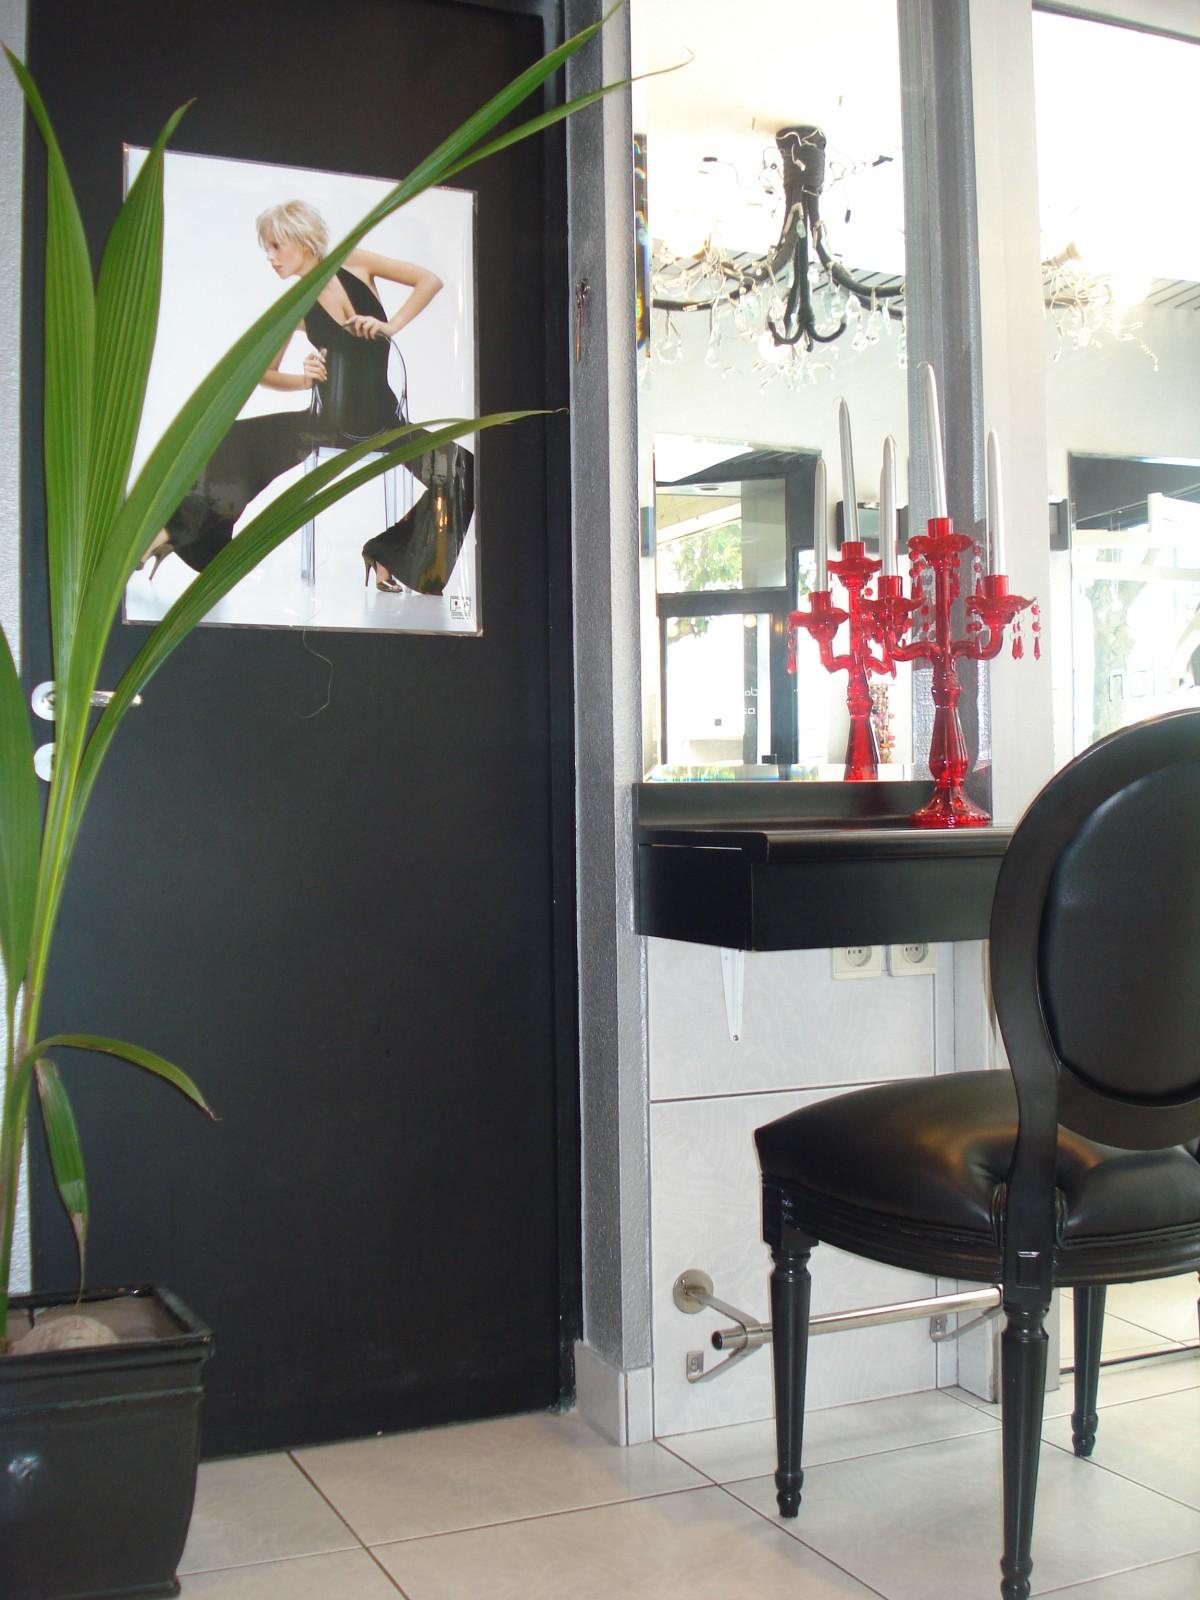 cot salon angers avis tarifs horaires t l phone. Black Bedroom Furniture Sets. Home Design Ideas